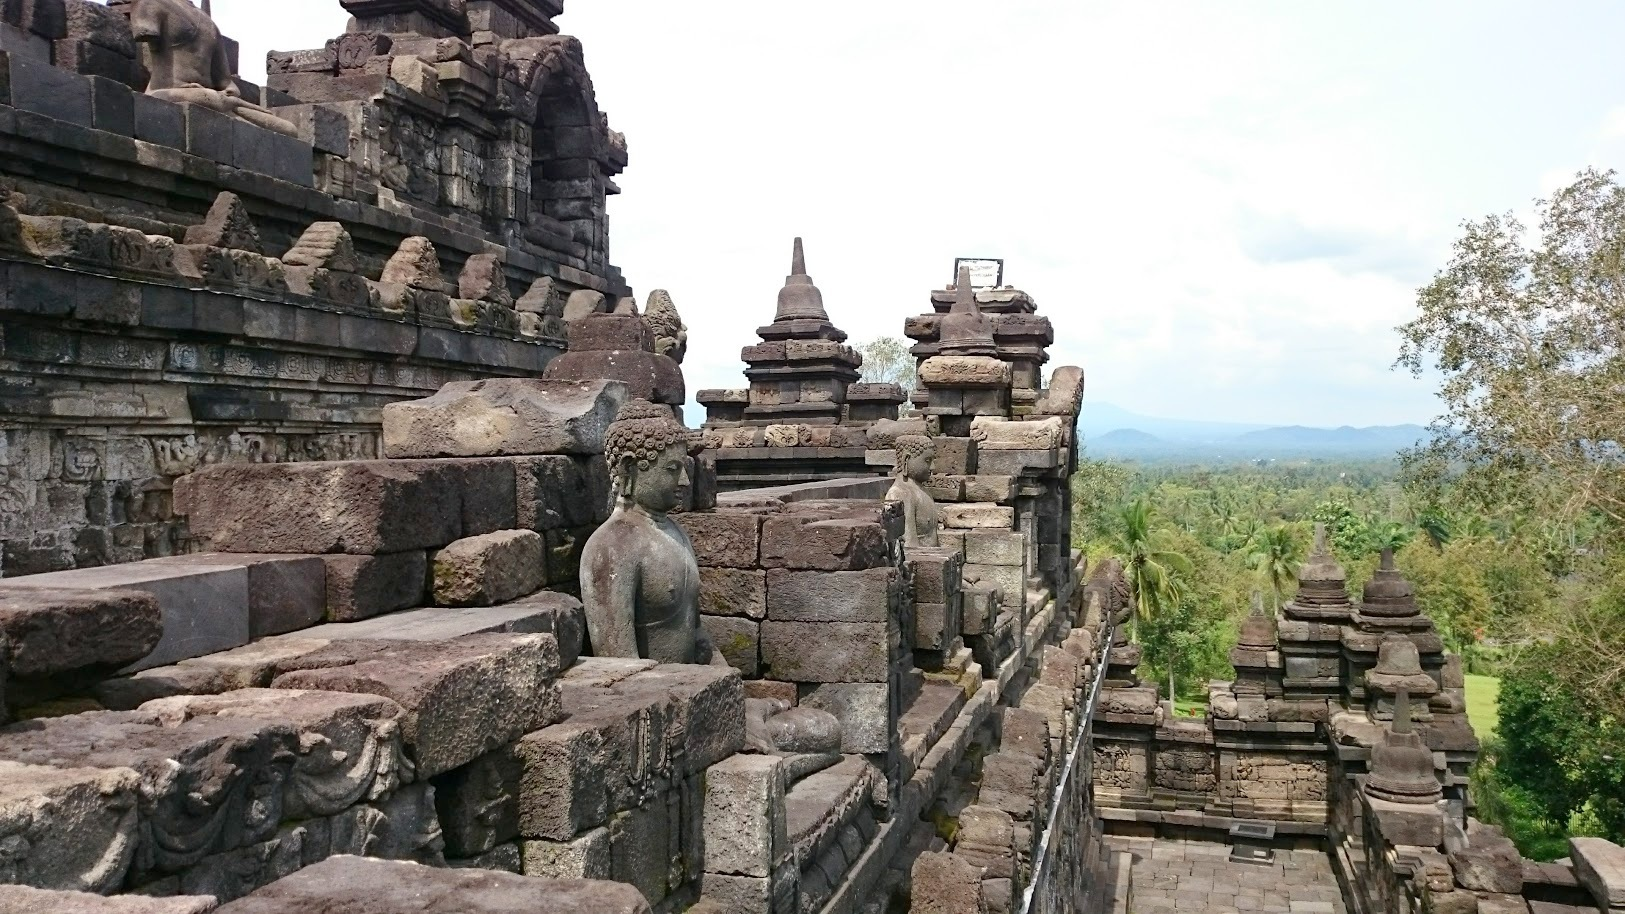 Borobudur temppeli Indonesia Yogyakarta